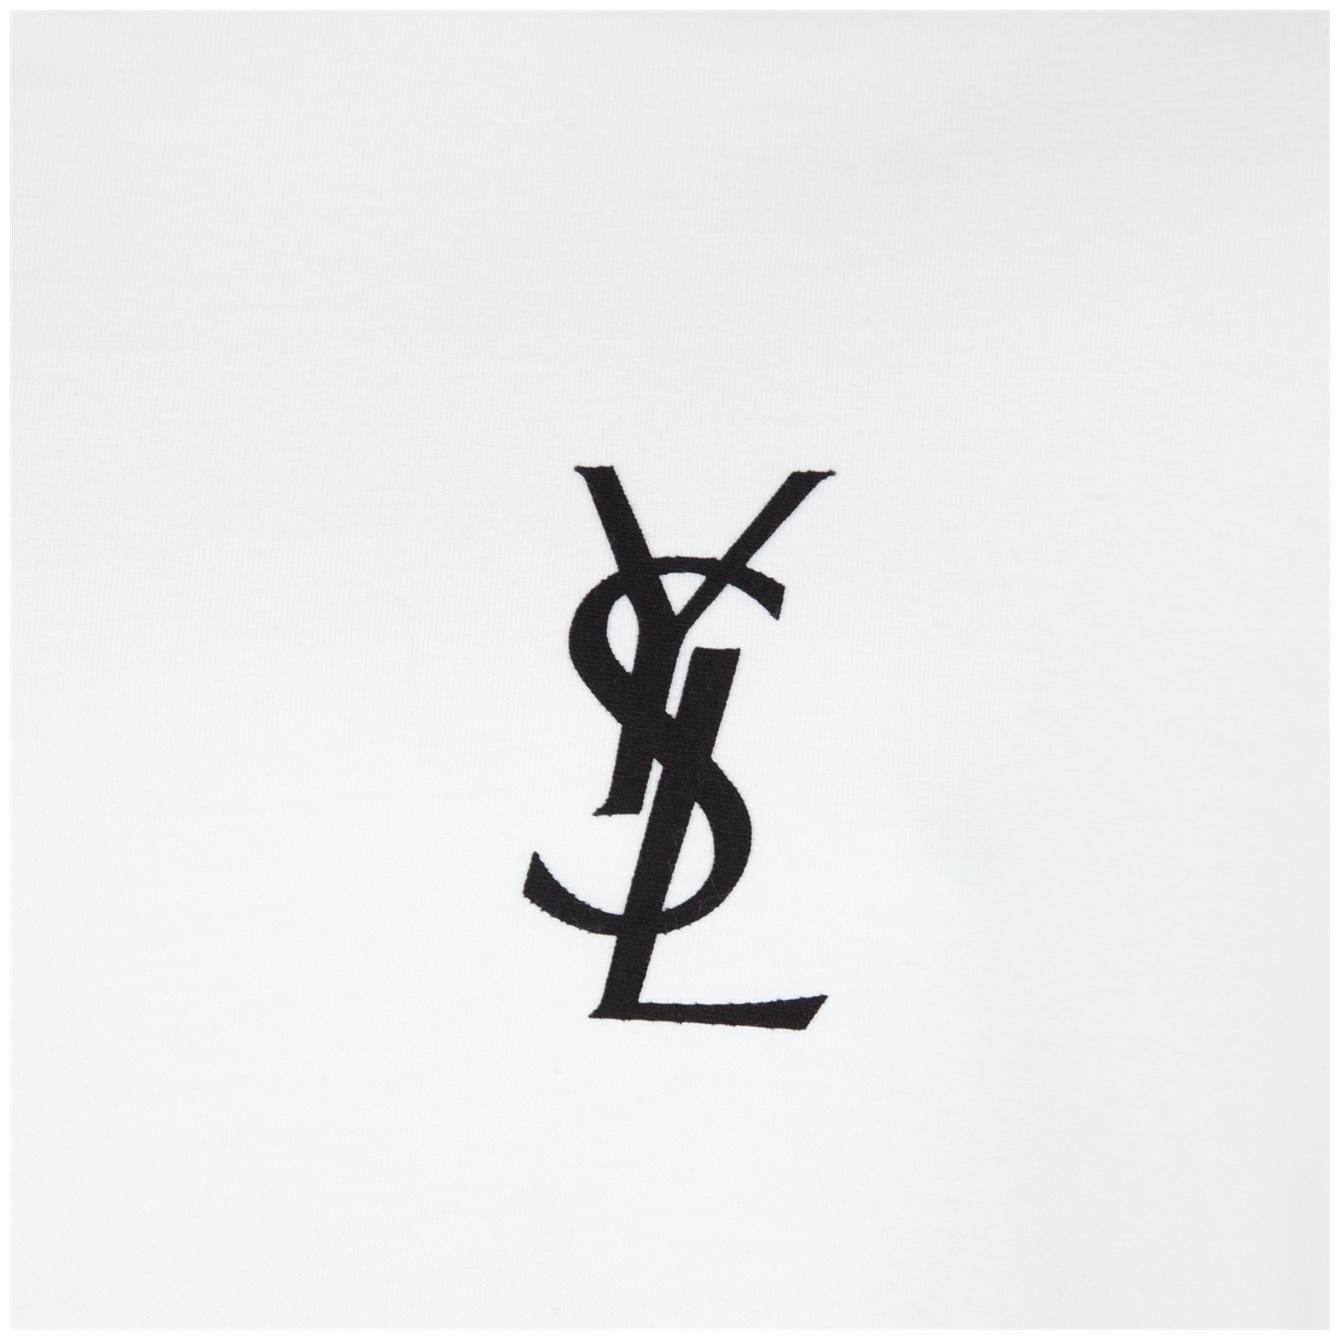 Photo collection ysl logo wallpaper related for Yves saint laurent logo shirt